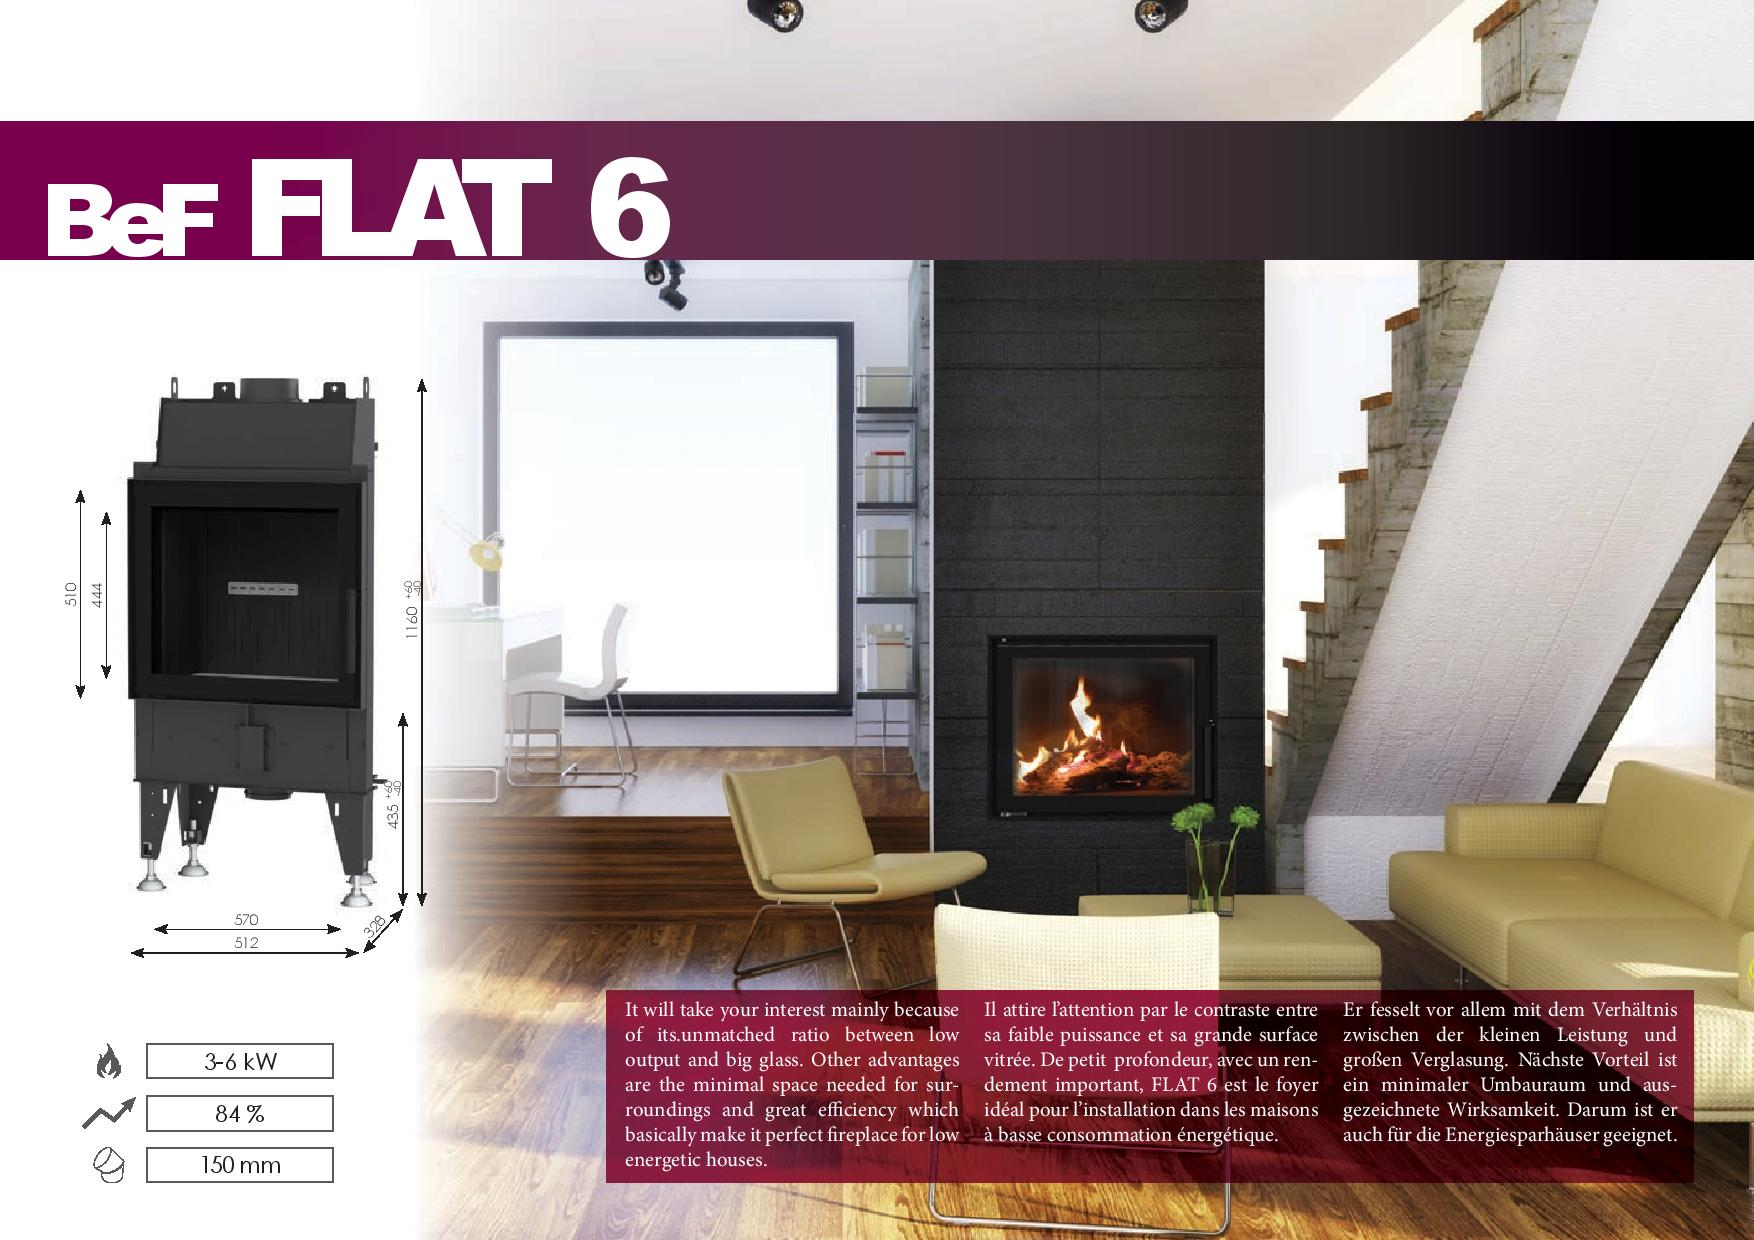 Foyers à bois FLAT BeF HOME 6 kw